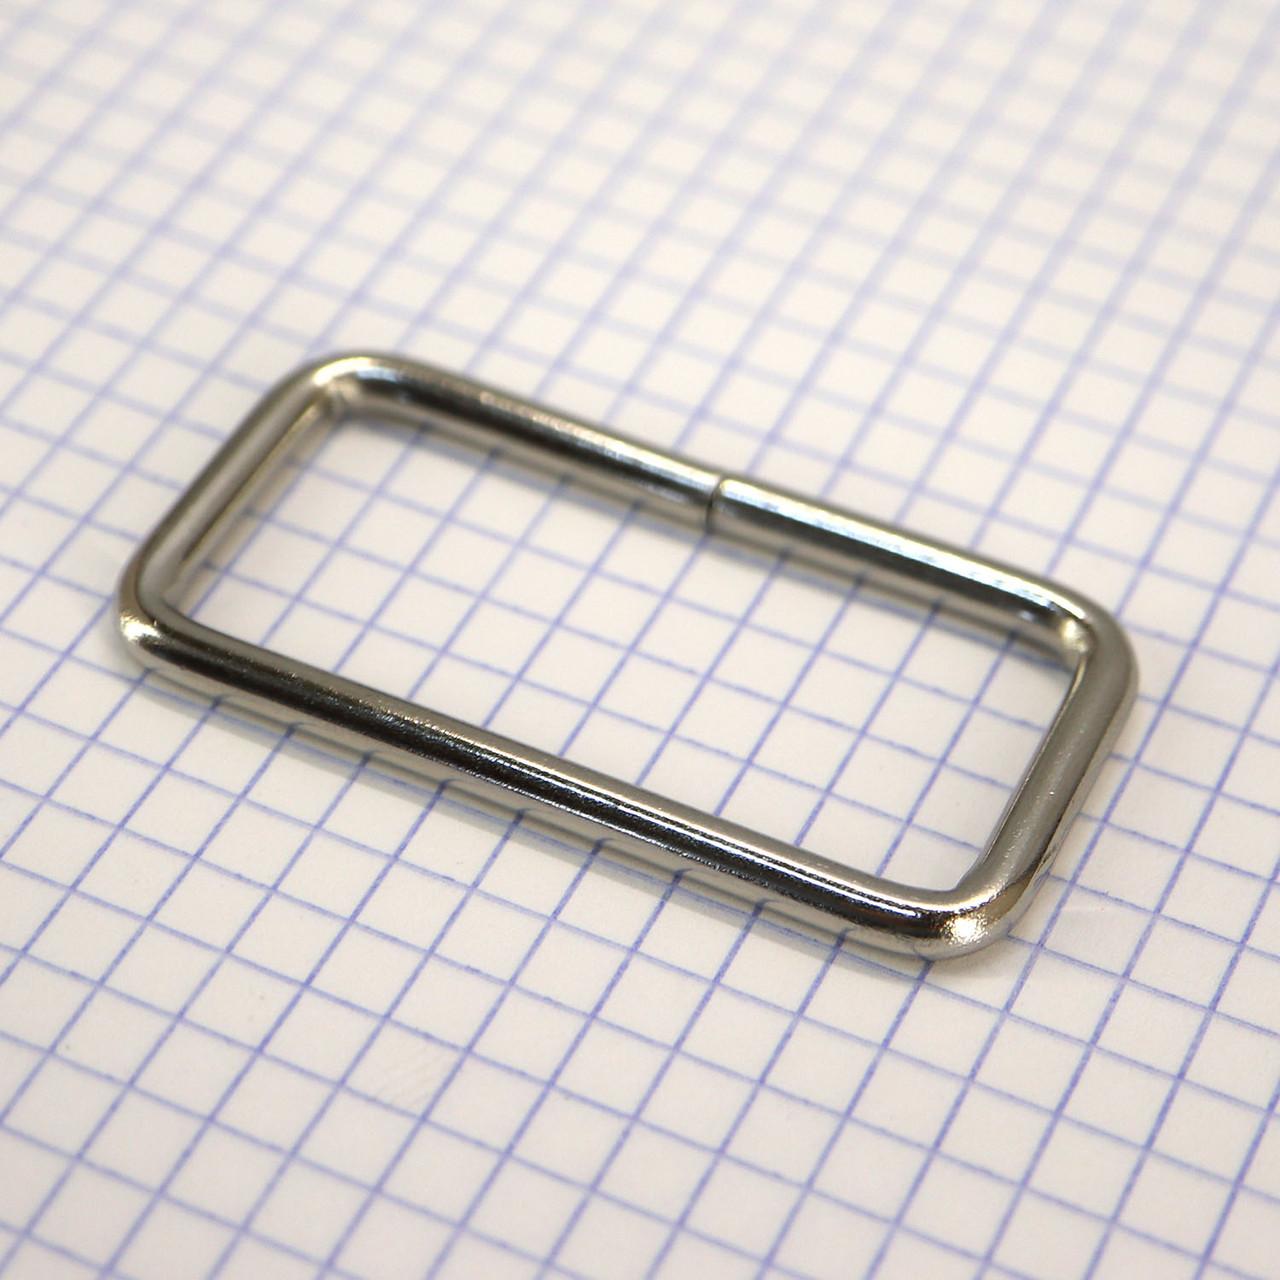 Рамка проволочная 50 мм никель для сумок t4129 (20 шт.)